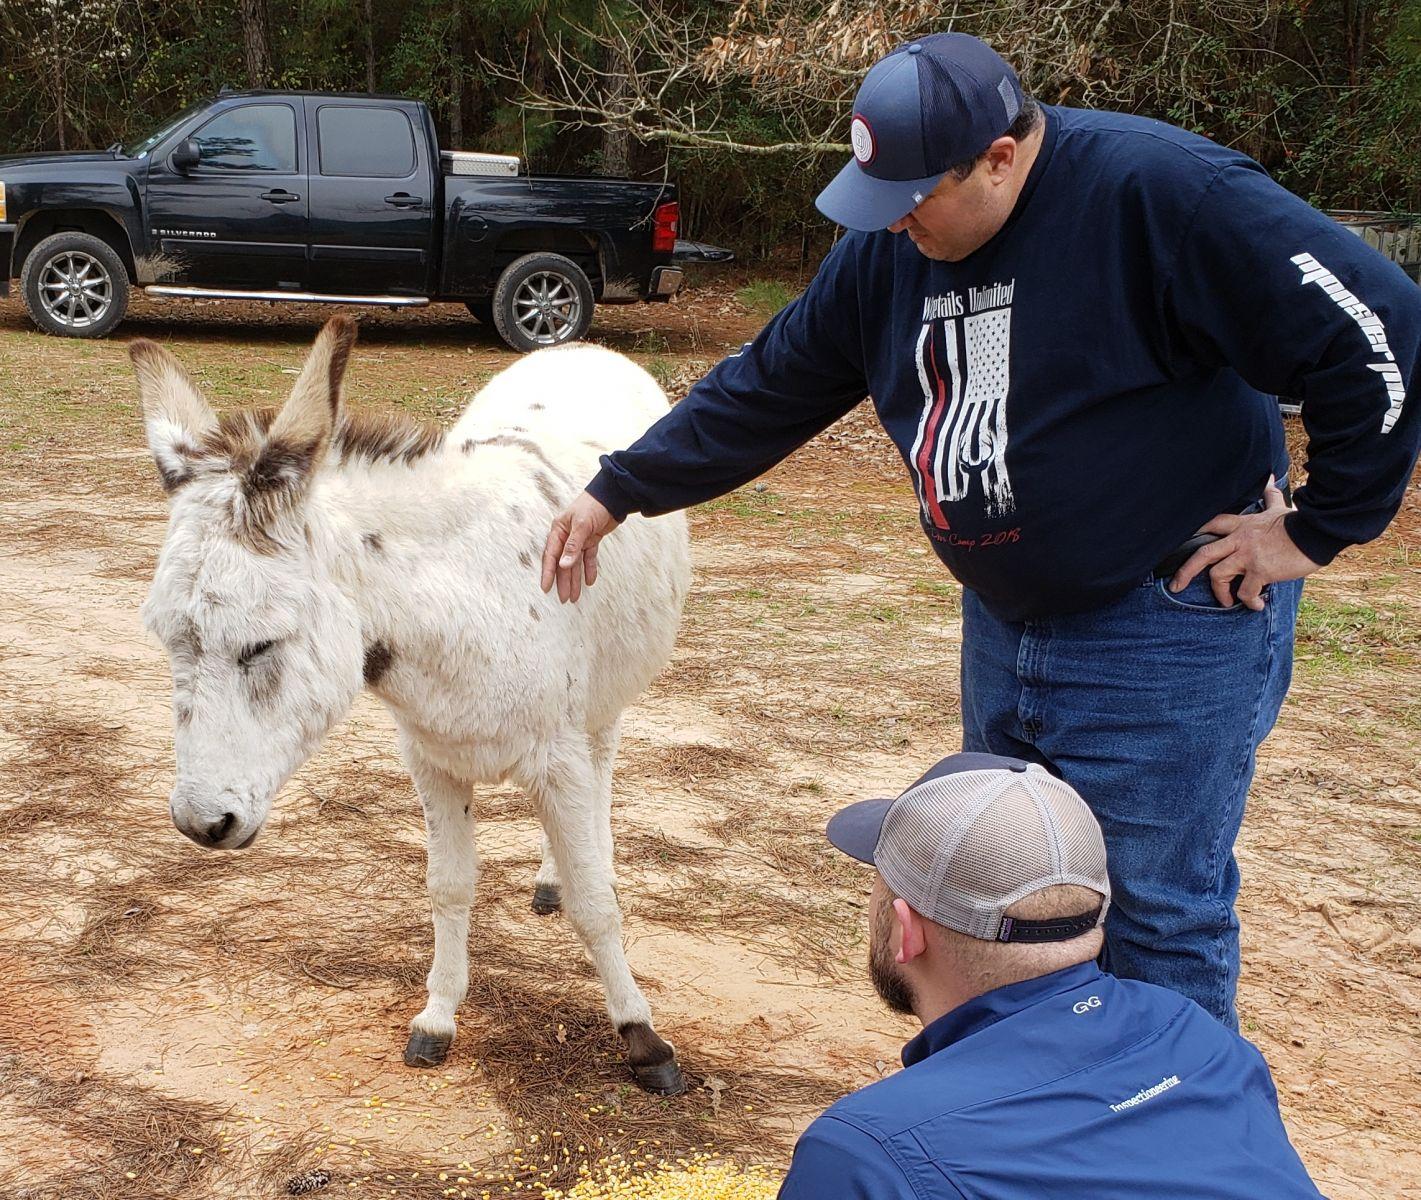 James Cesarini, Tyler Alvarado, and Milkshake, the donkey.